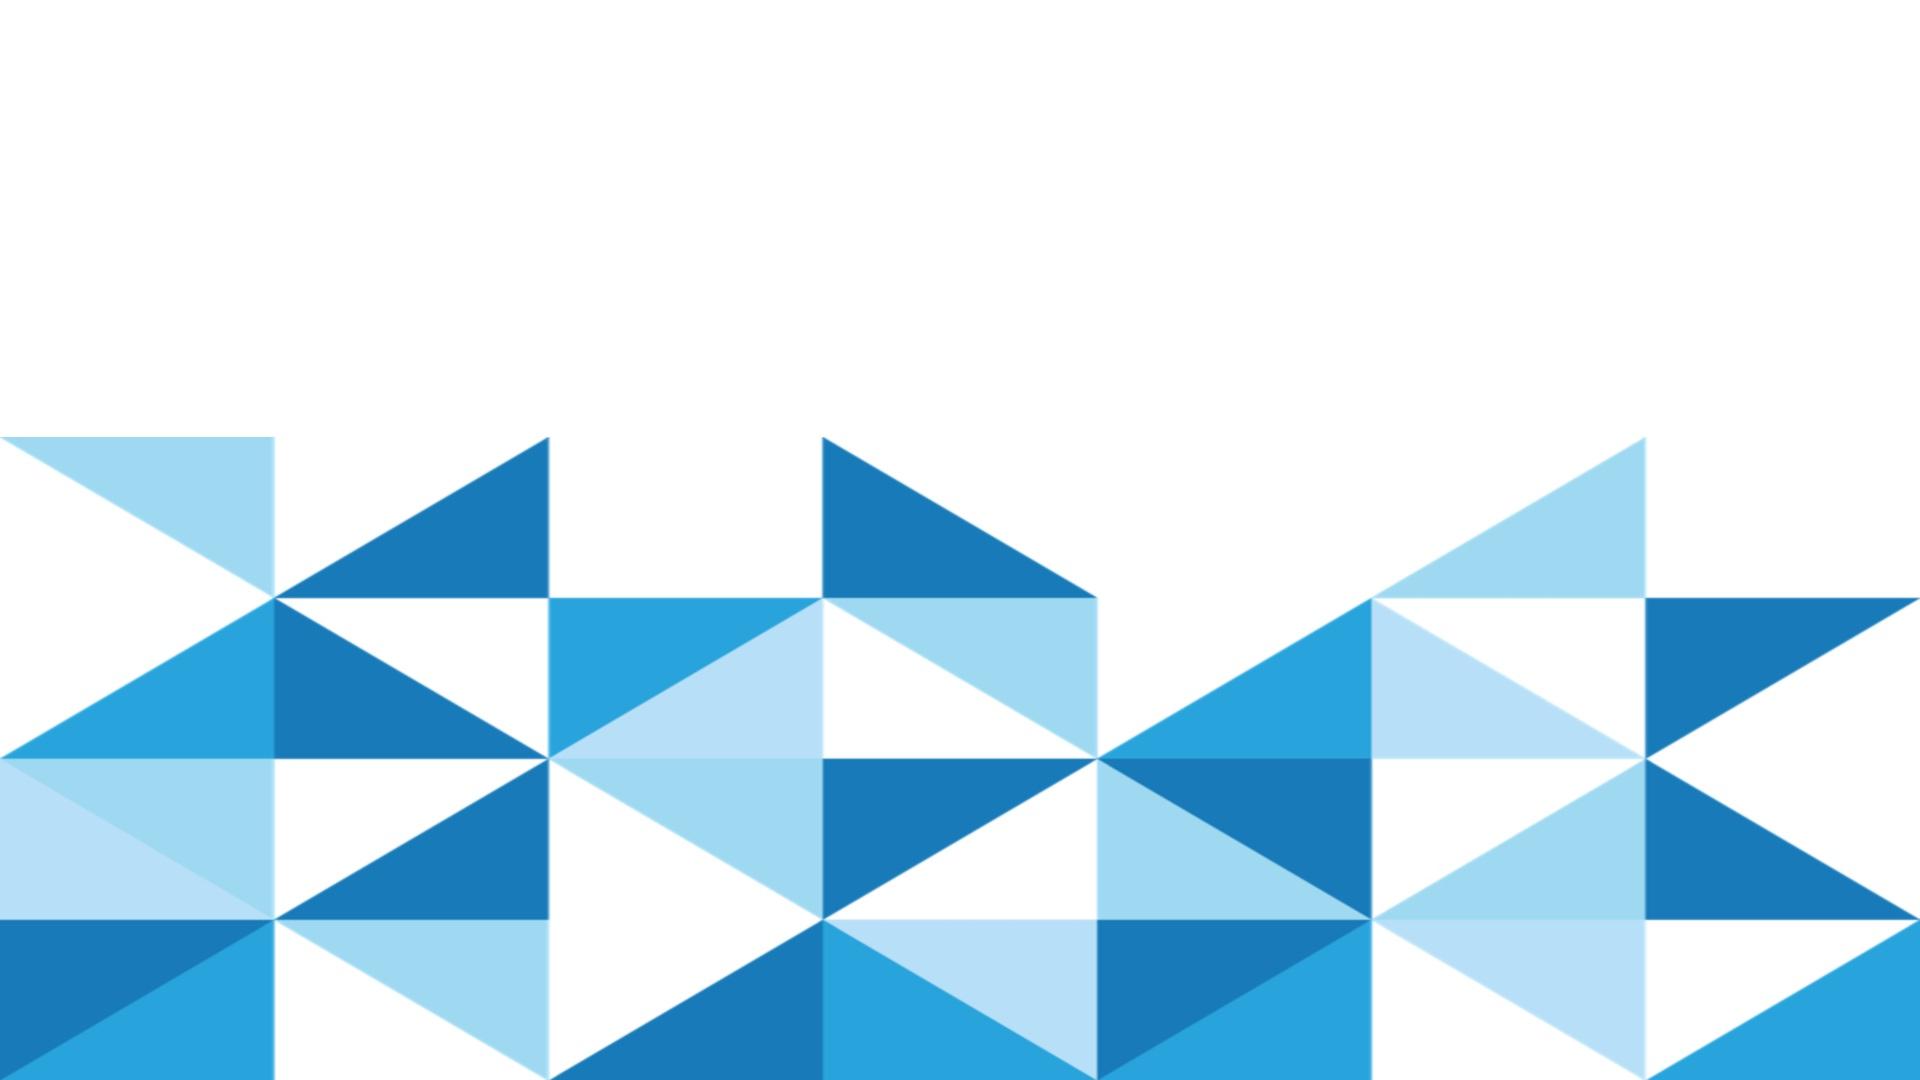 Blue Lighting Background.